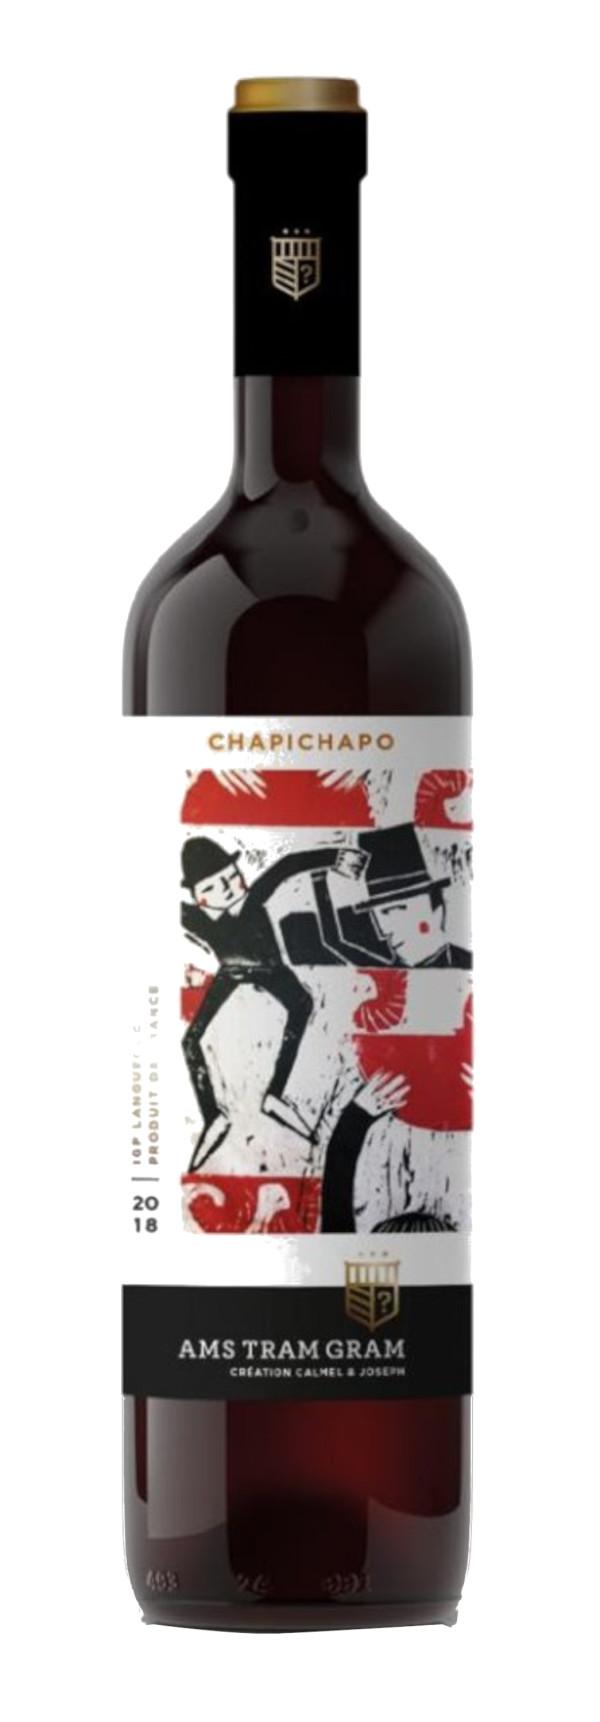 Photo Vin rouge pays d'oc Ams tram gram